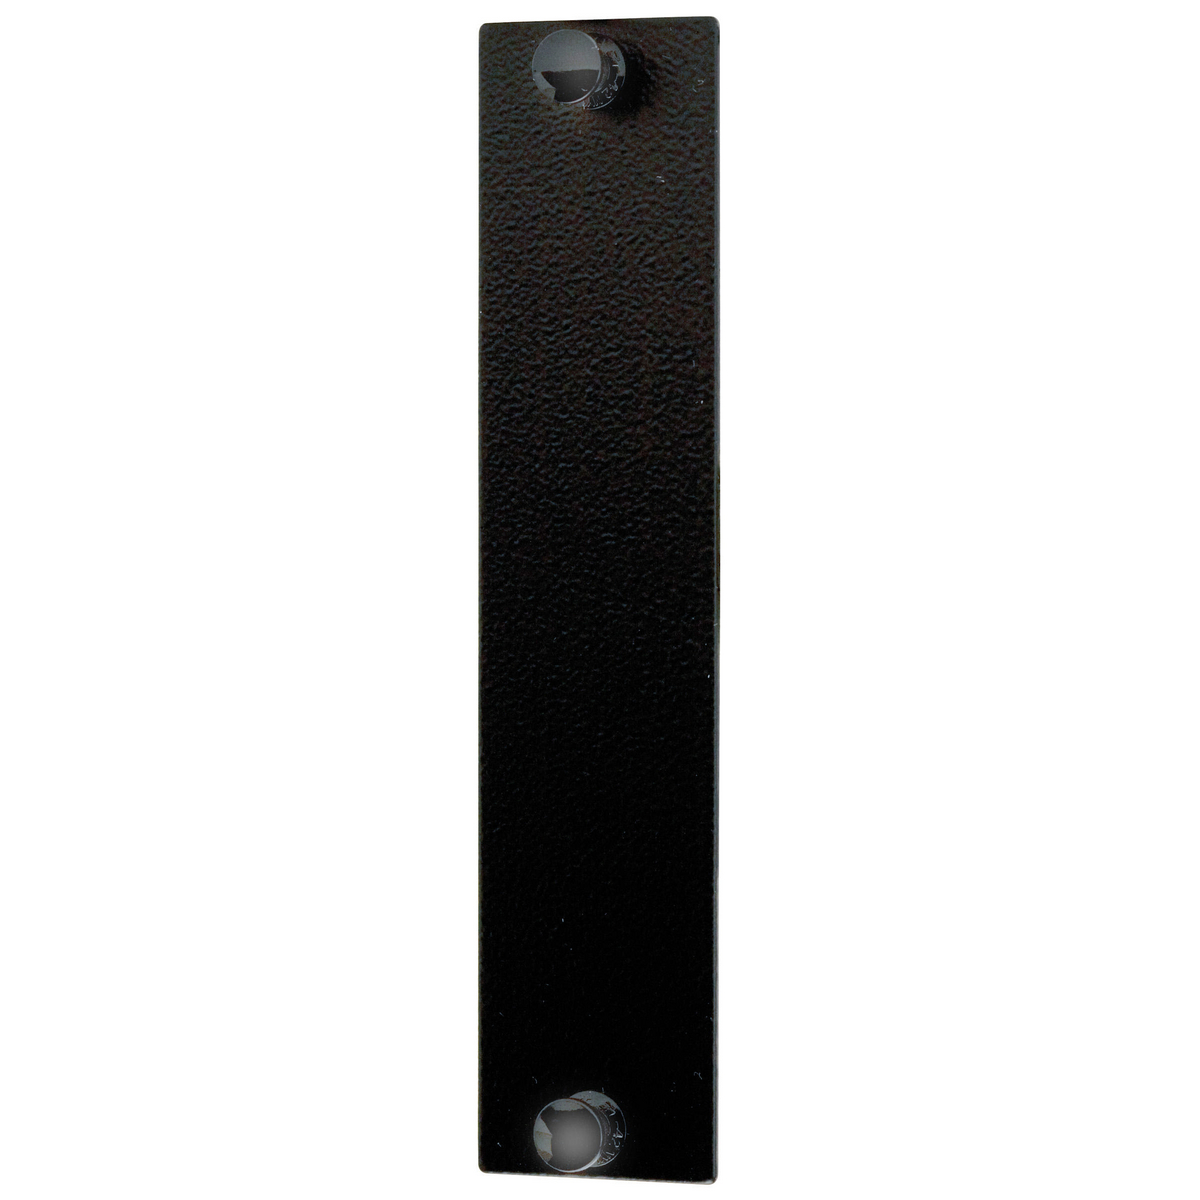 Hubbell FSPB Snap-In Blank Unloaded FSP Adapter Panel